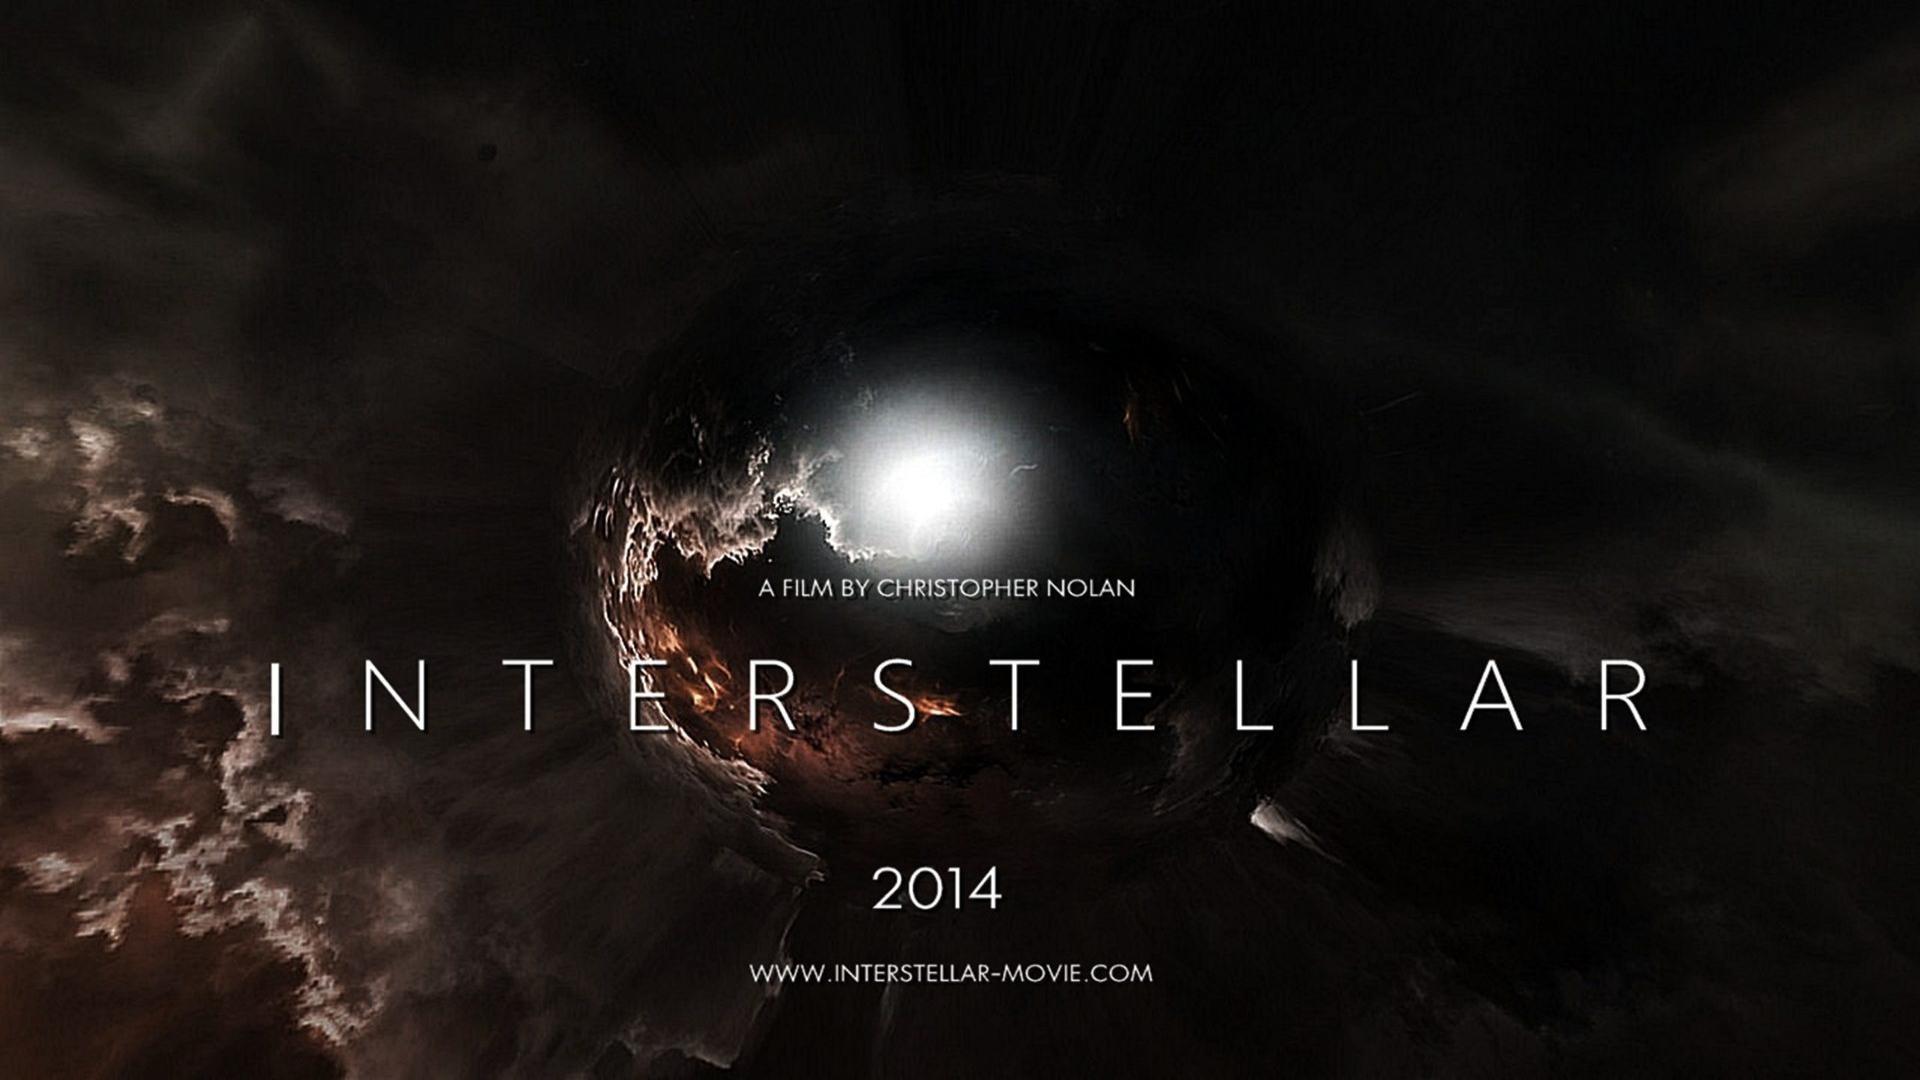 687 Interstellar Wallpaper Hd Desktop Background 1920×1080 1426776597